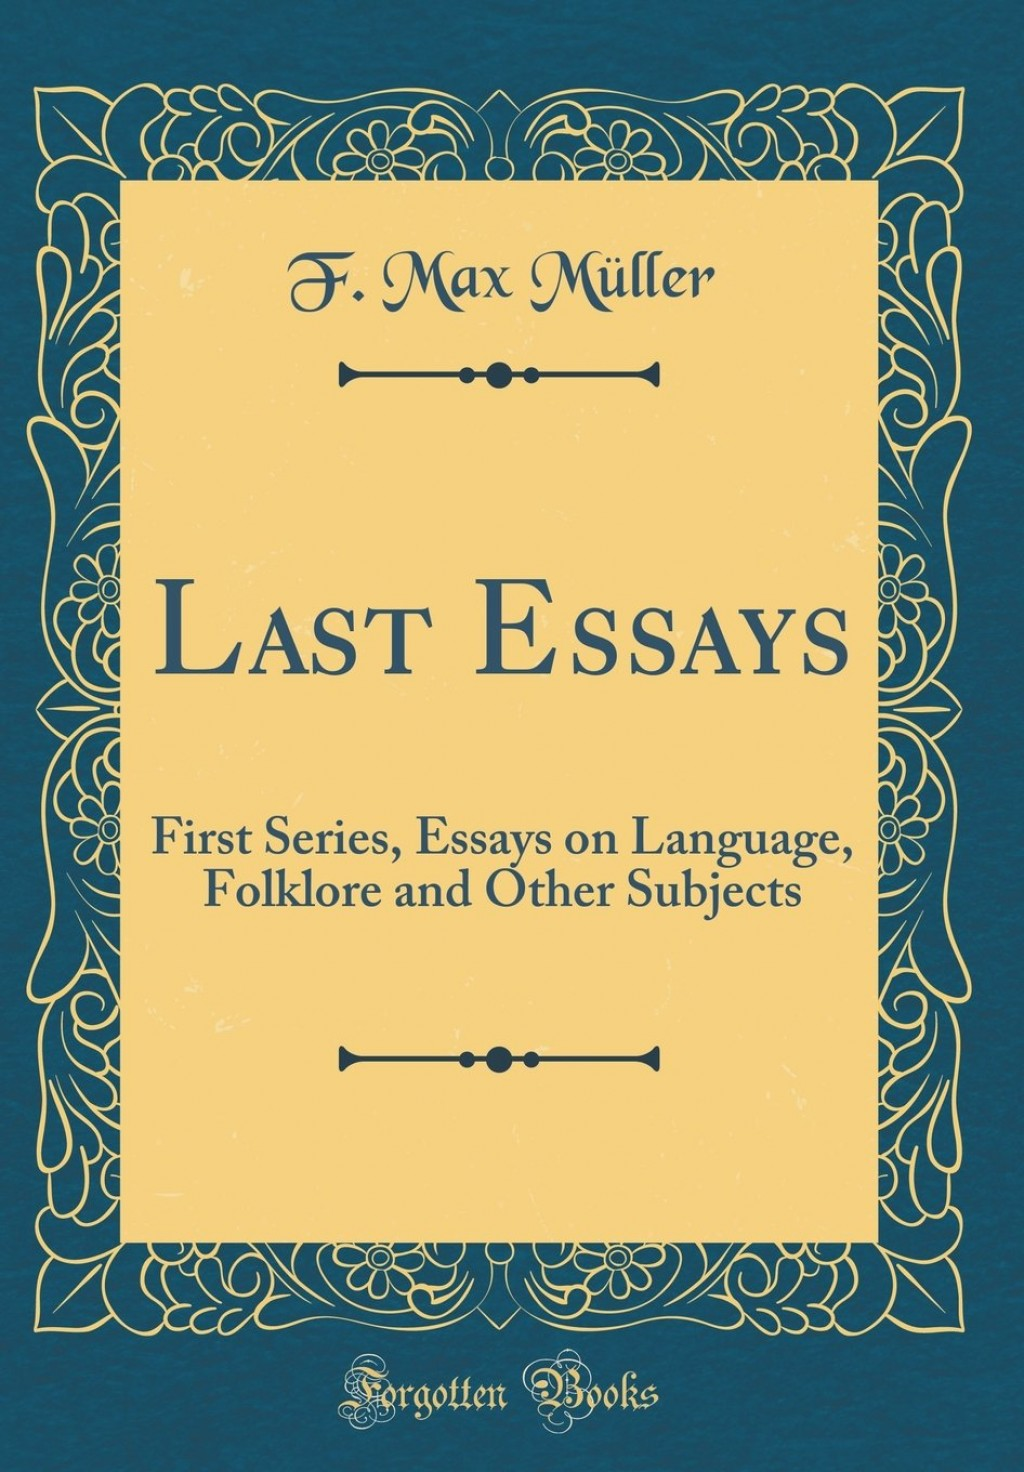 016 712b4xpd8bkl Essays First Series Essay Stunning Emerson Pdf Shelburne Publisher Large